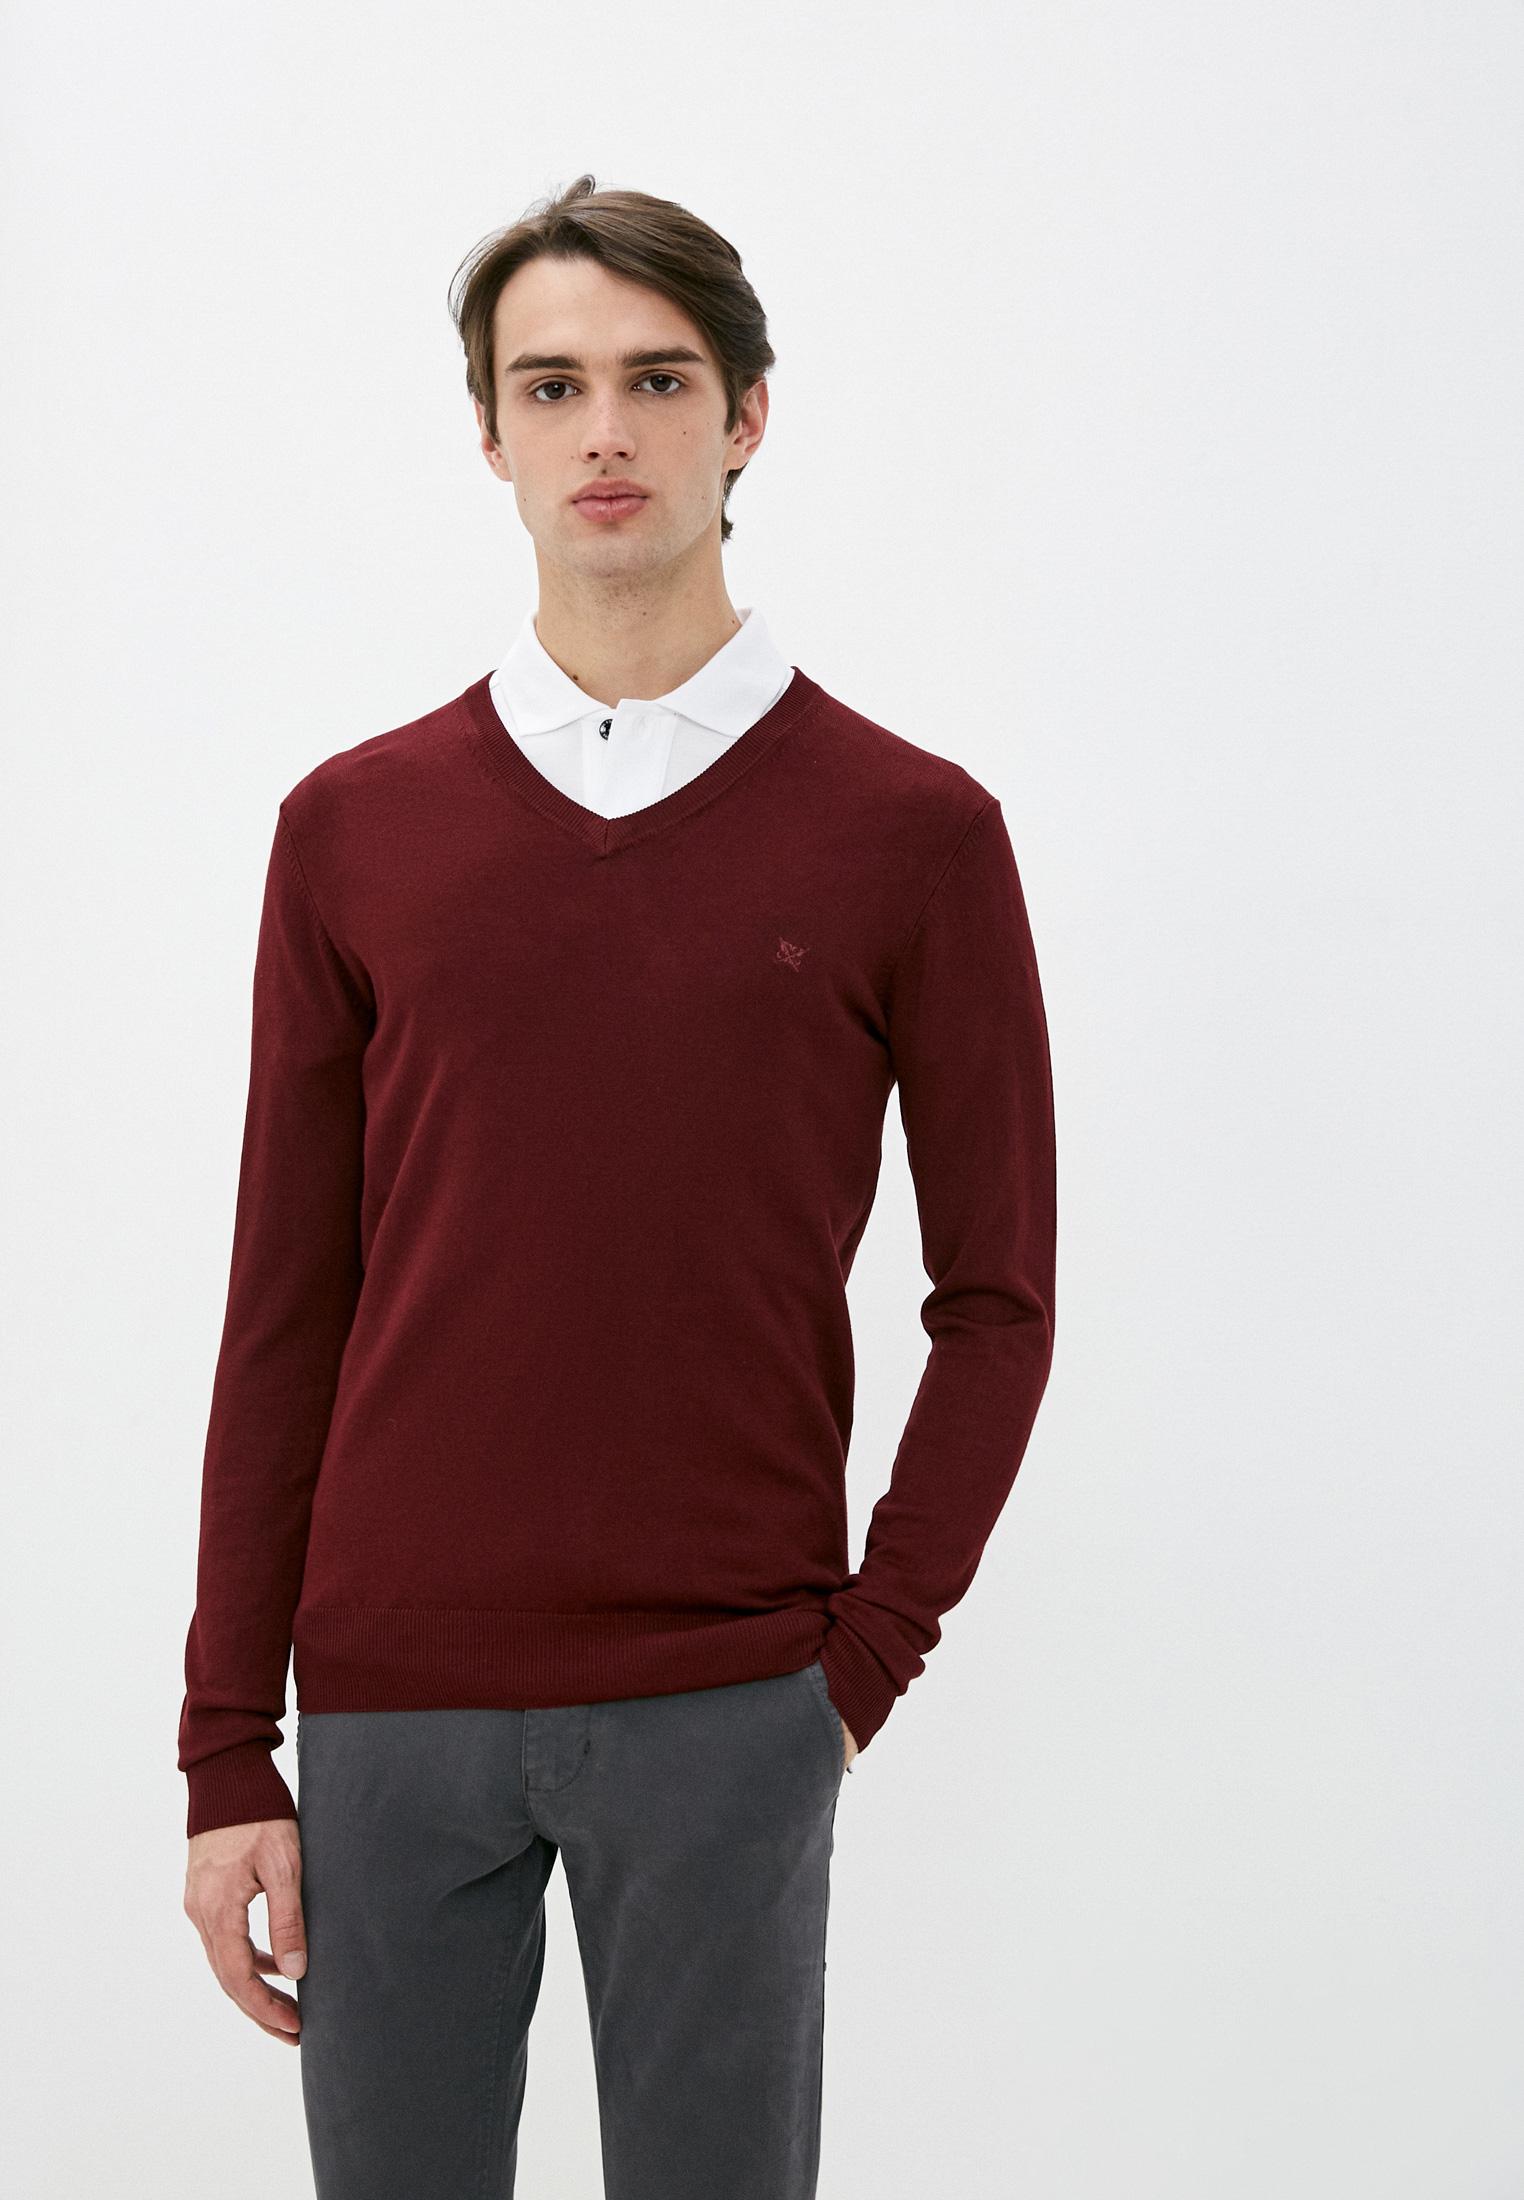 Пуловер Old Seams Пуловер Old Seams